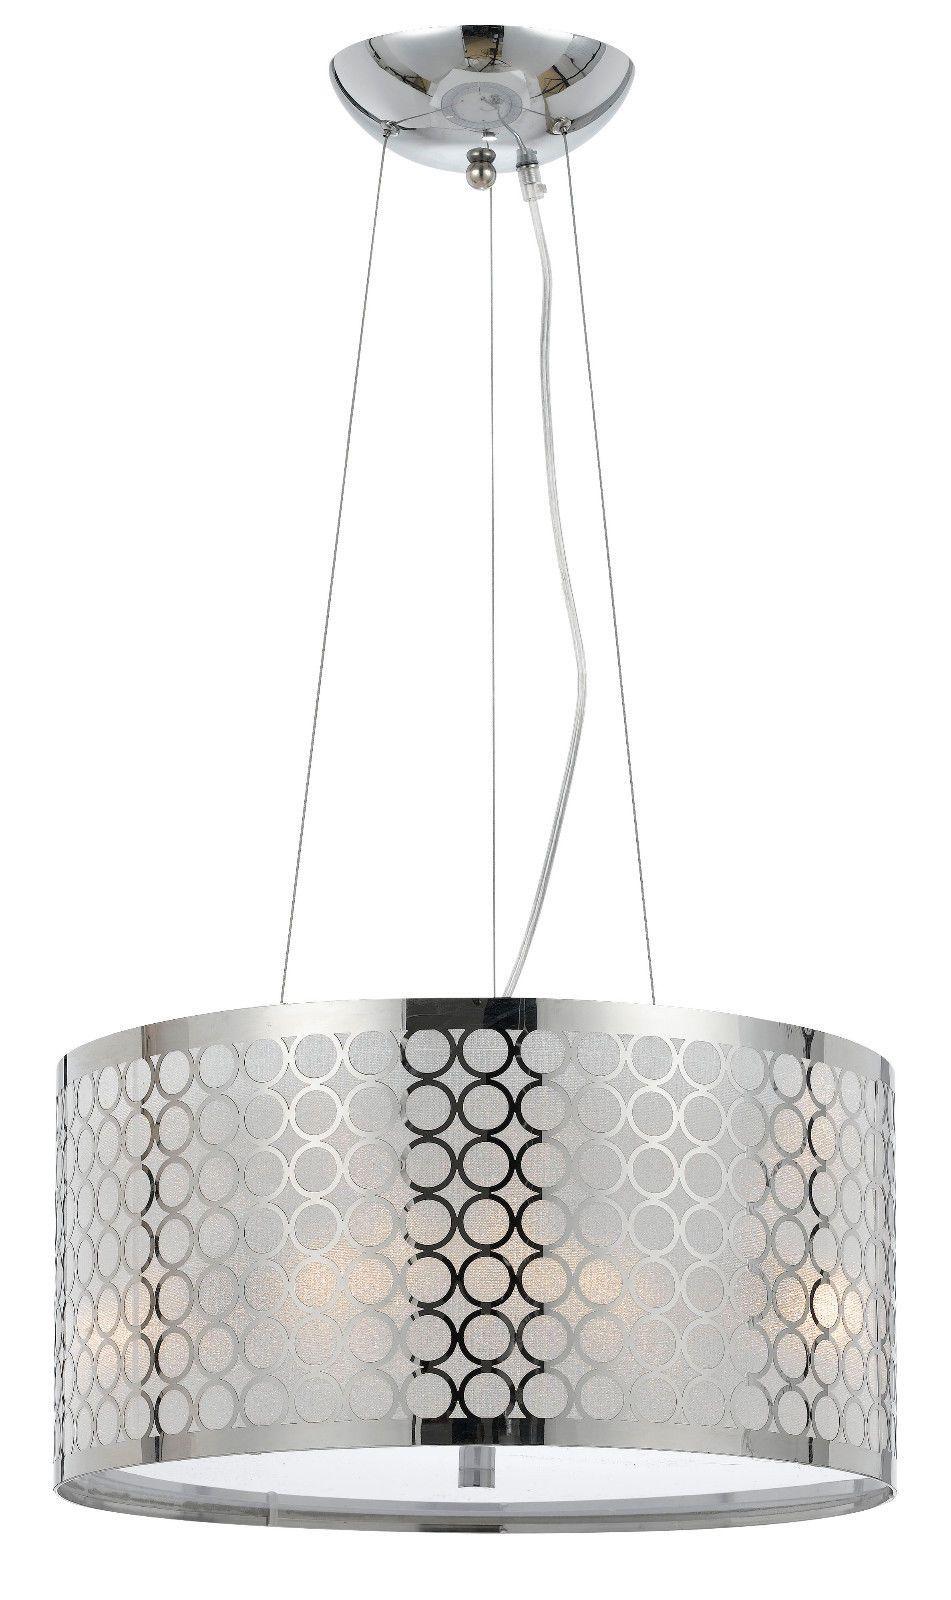 chrome & white metallic fabric modern drum pendant light fixture